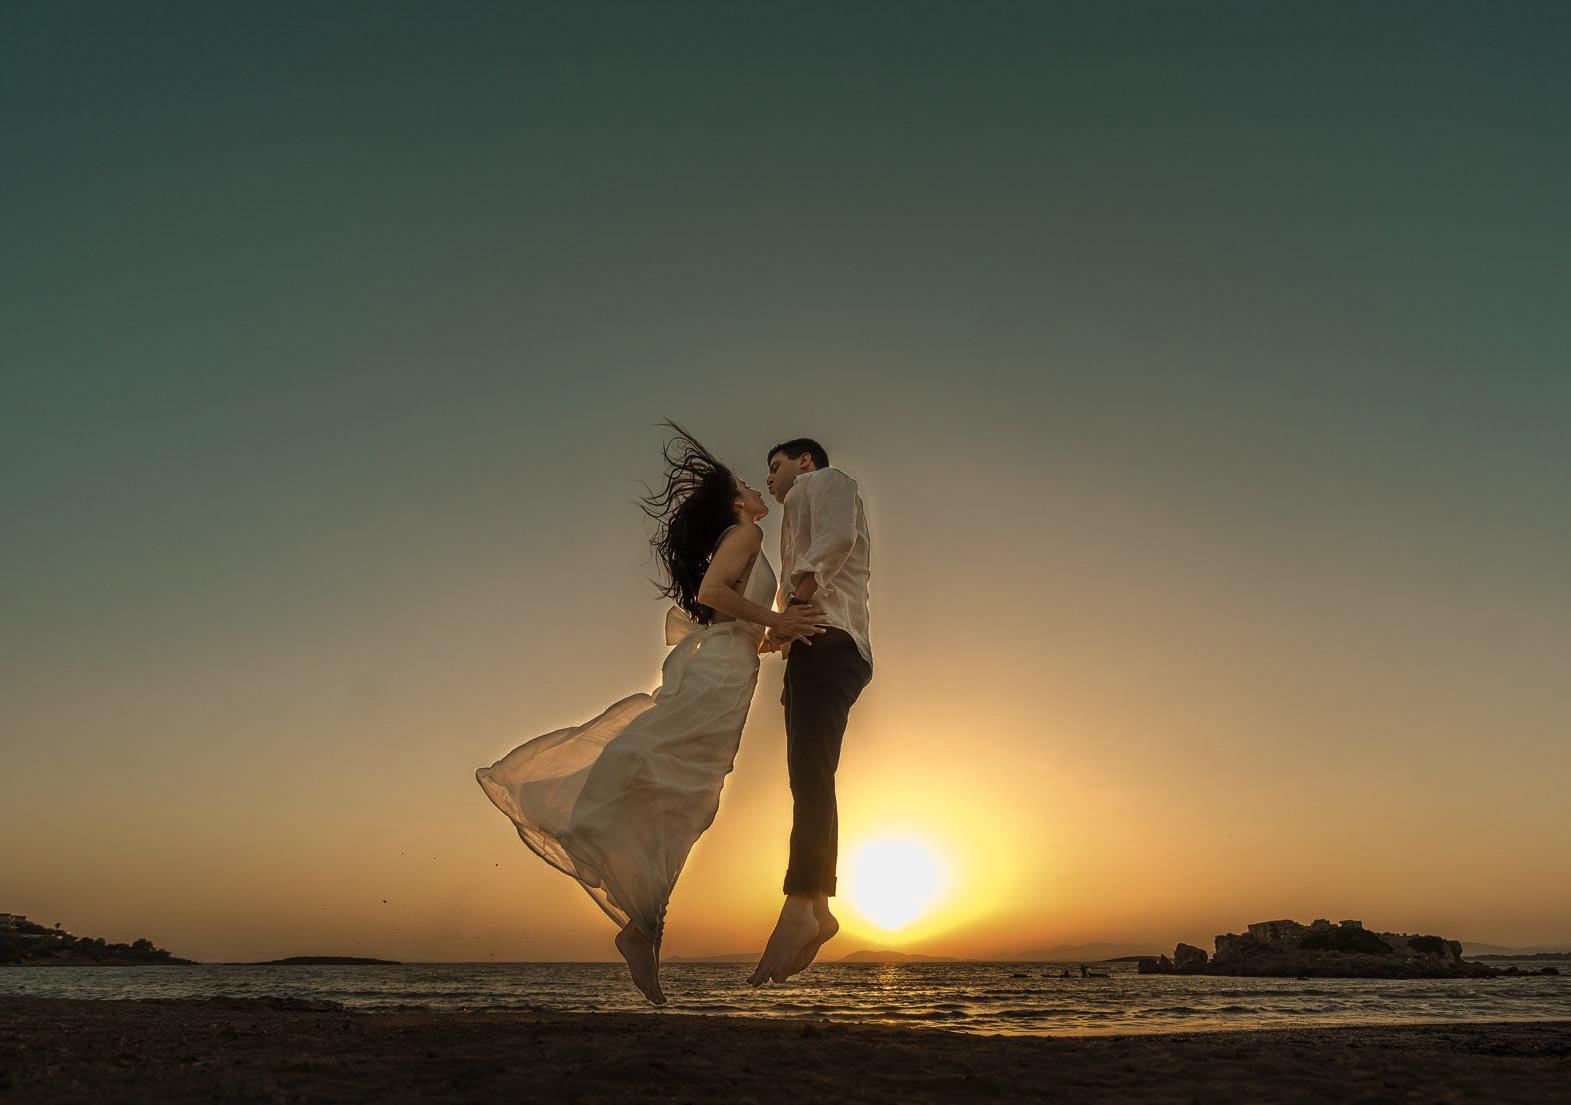 80f441ce8 Wedding & Elopement Photographer and Videographer in Greece, Mykonos,  Santorini, Tuscany, Umbria, Venezia, Positano, Italy, Iceland, Switzerland